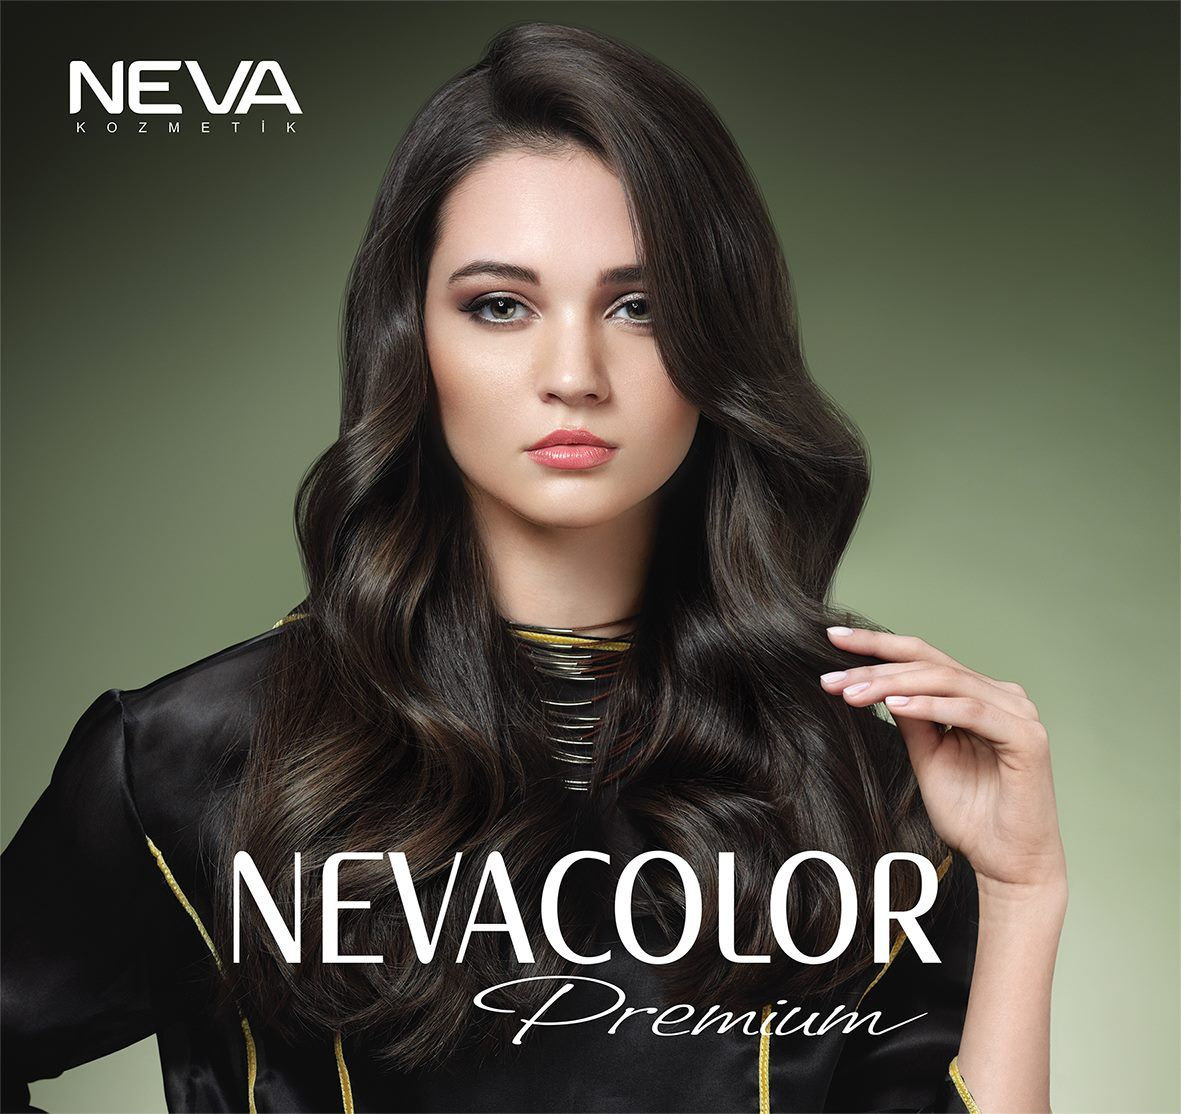 Nevacolor Premium Sac Boyasi Renkleri 2019 2019 Sac Boyasi Sac